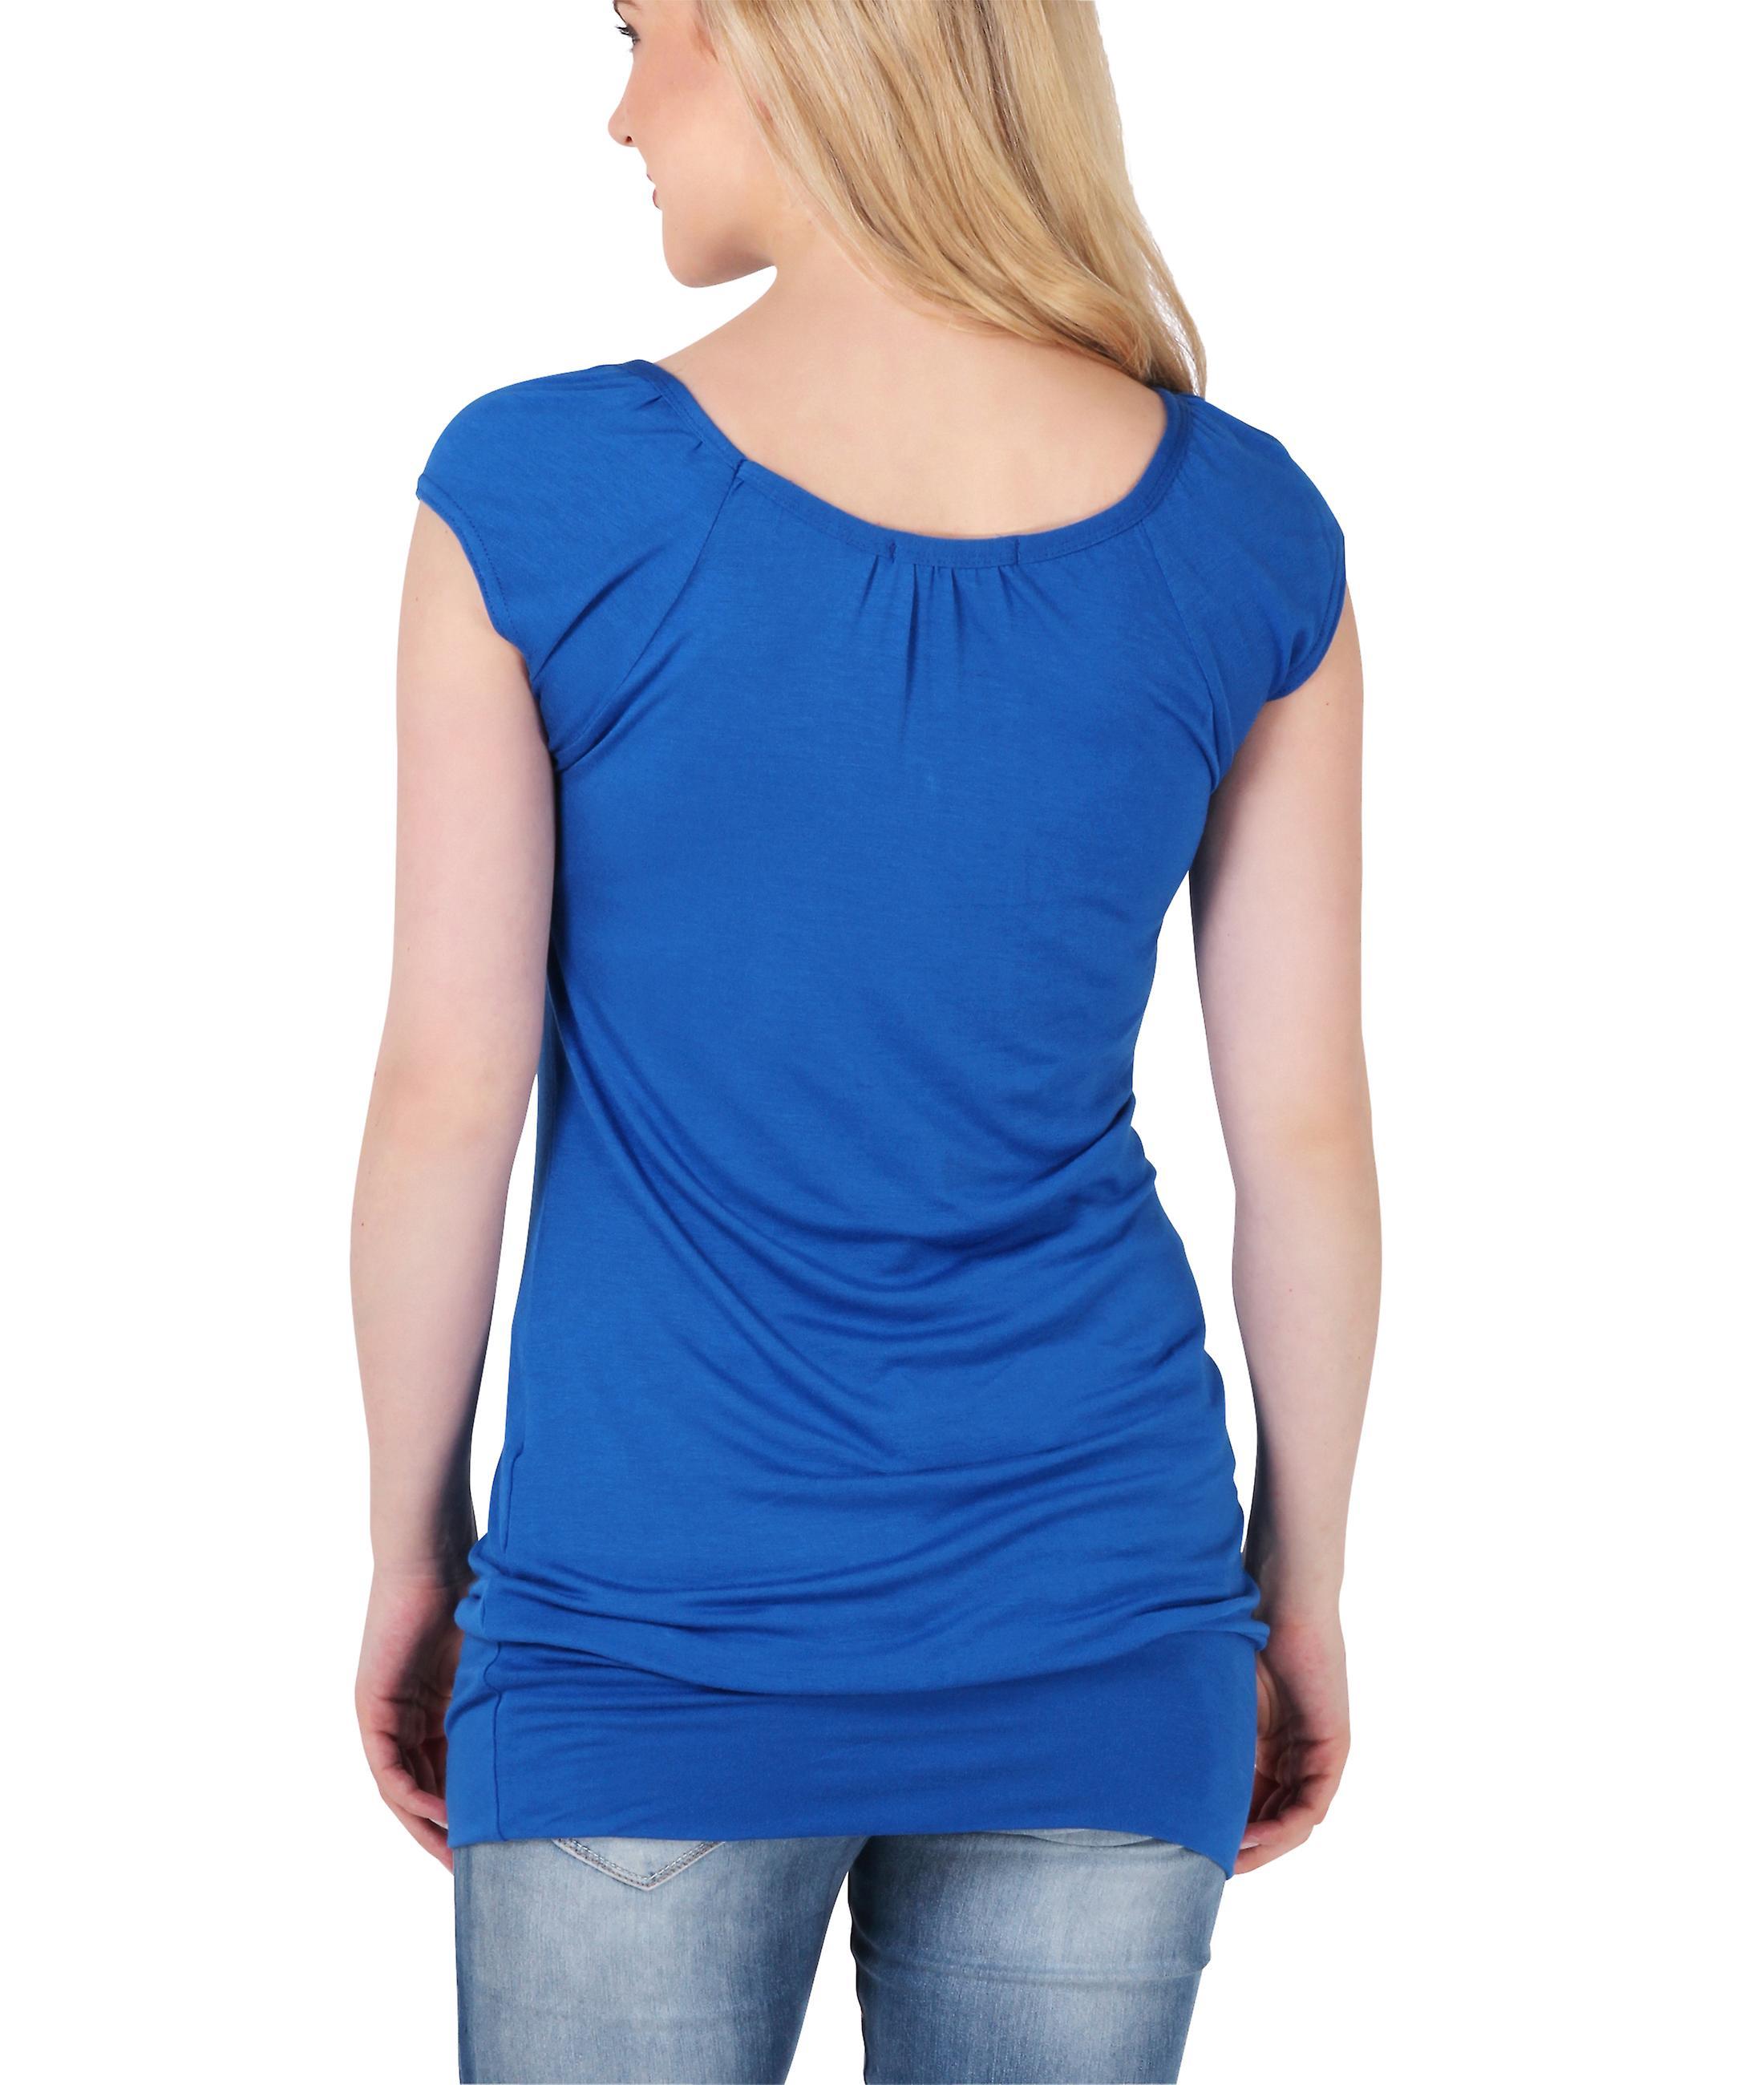 KRISP Cute Comfortable T-Shirt Long Design Short Sleeves Casual Top